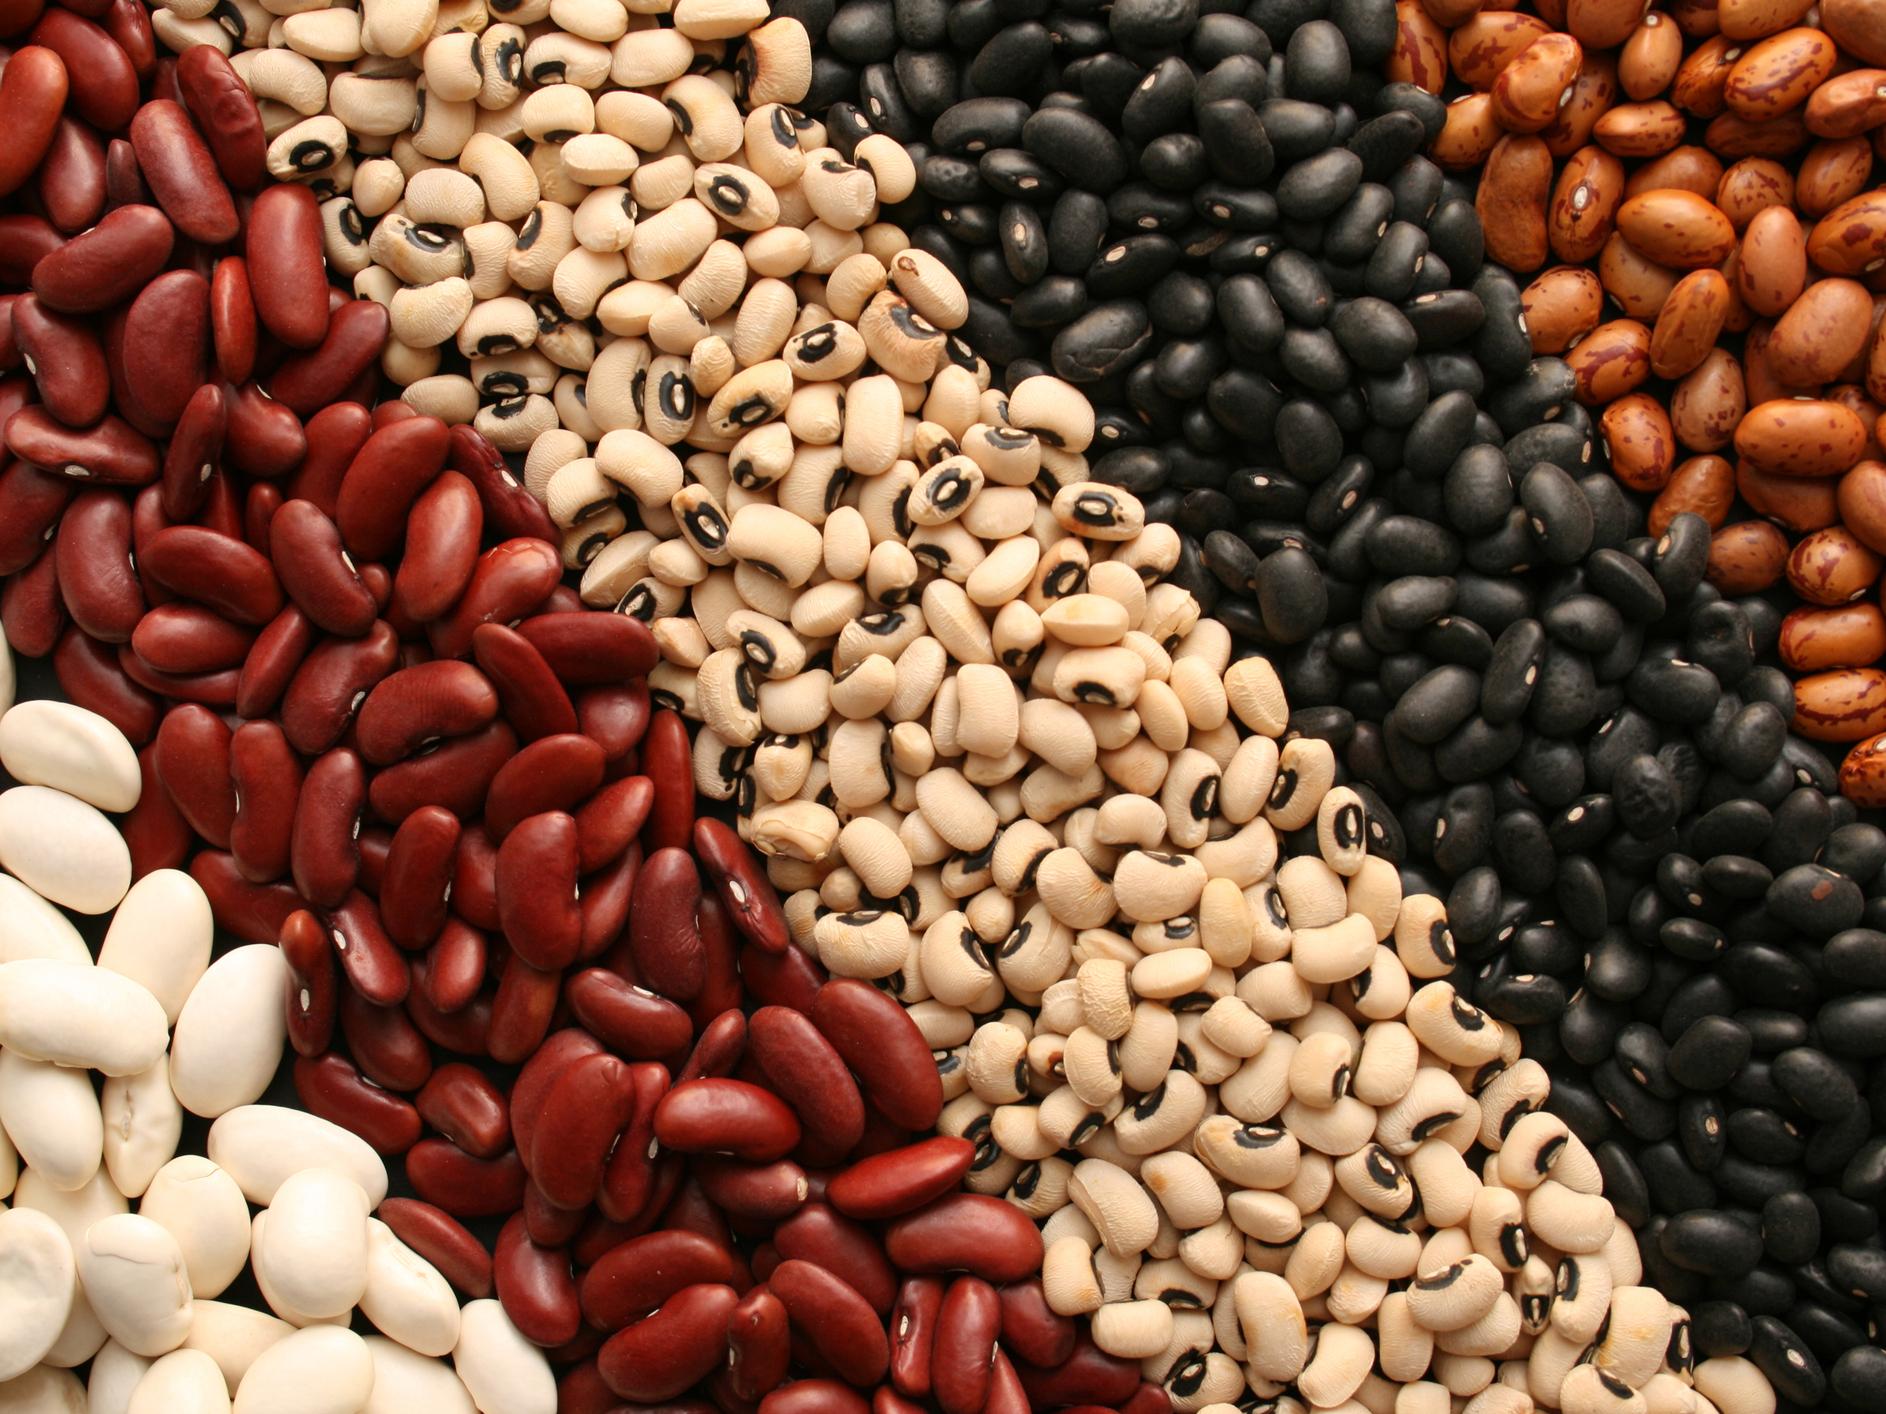 AN78-Beans_dry-732x549-Thumb.jpg